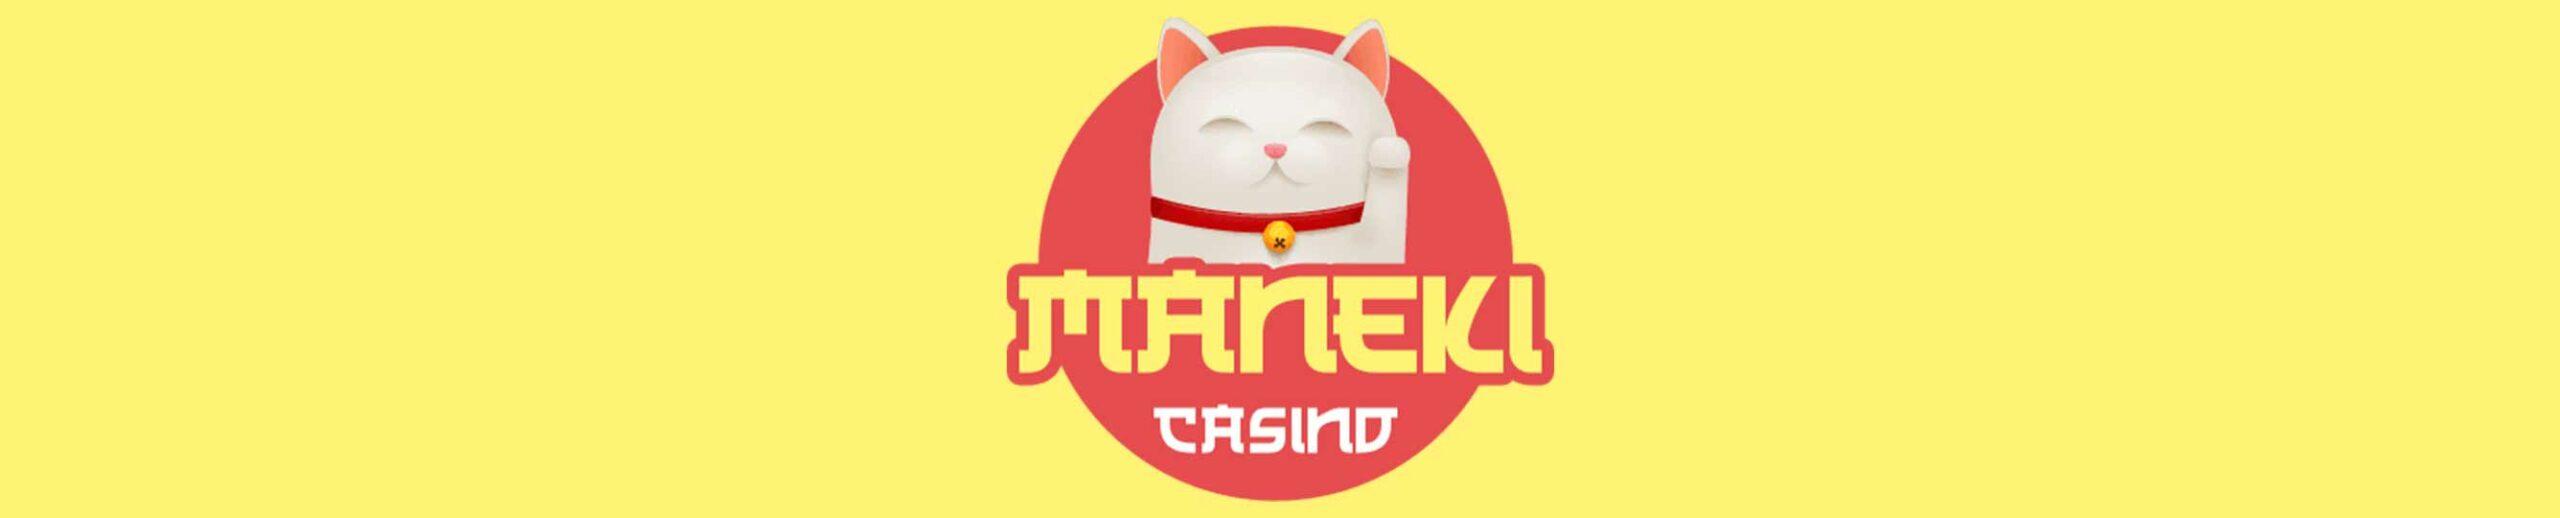 Maneki Casino - Test